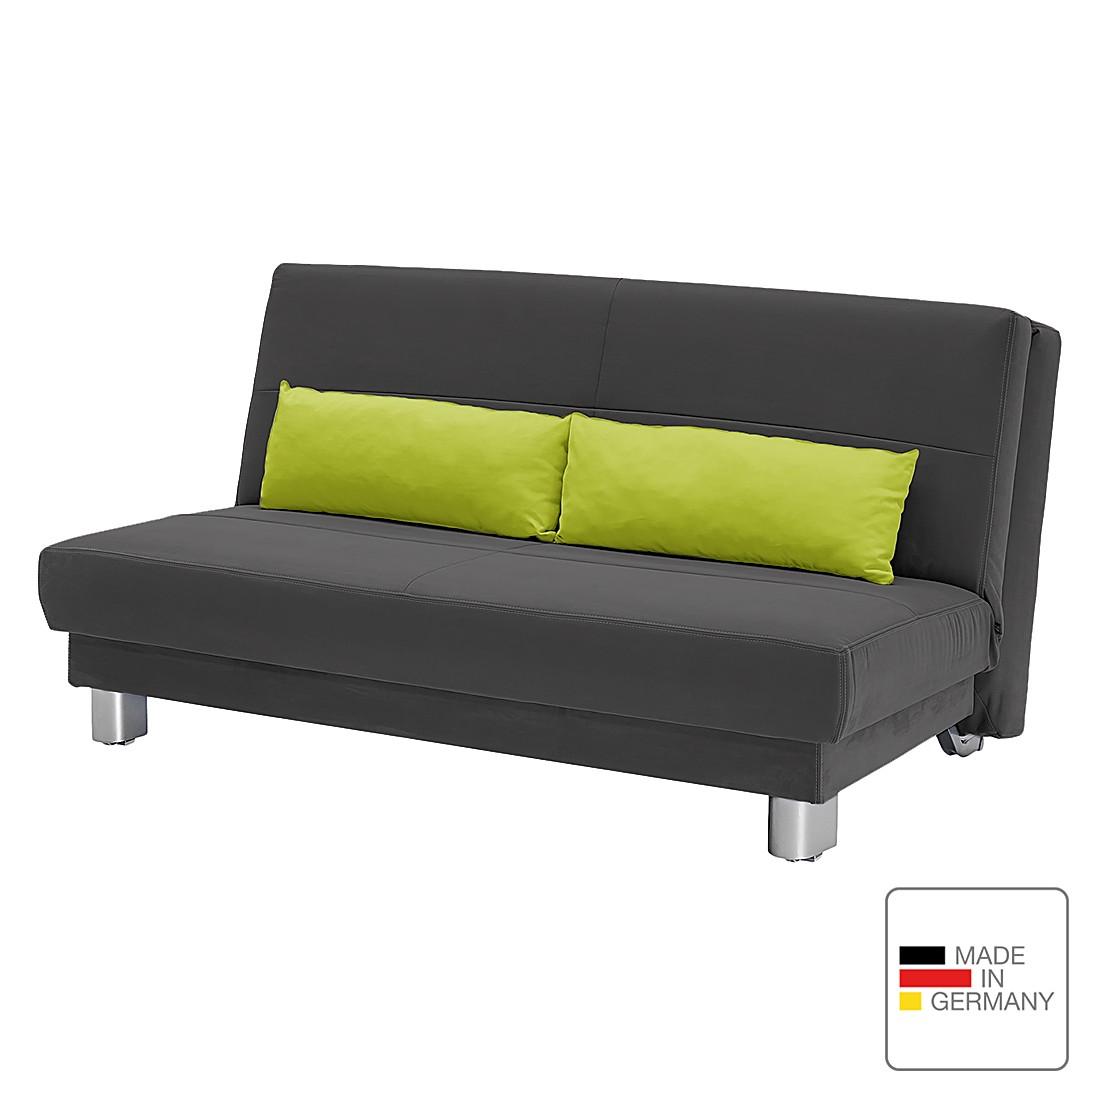 Schlafsofa Motard – Flachgewebe – Grau / Grün – 158 cm, Studio Monroe online kaufen